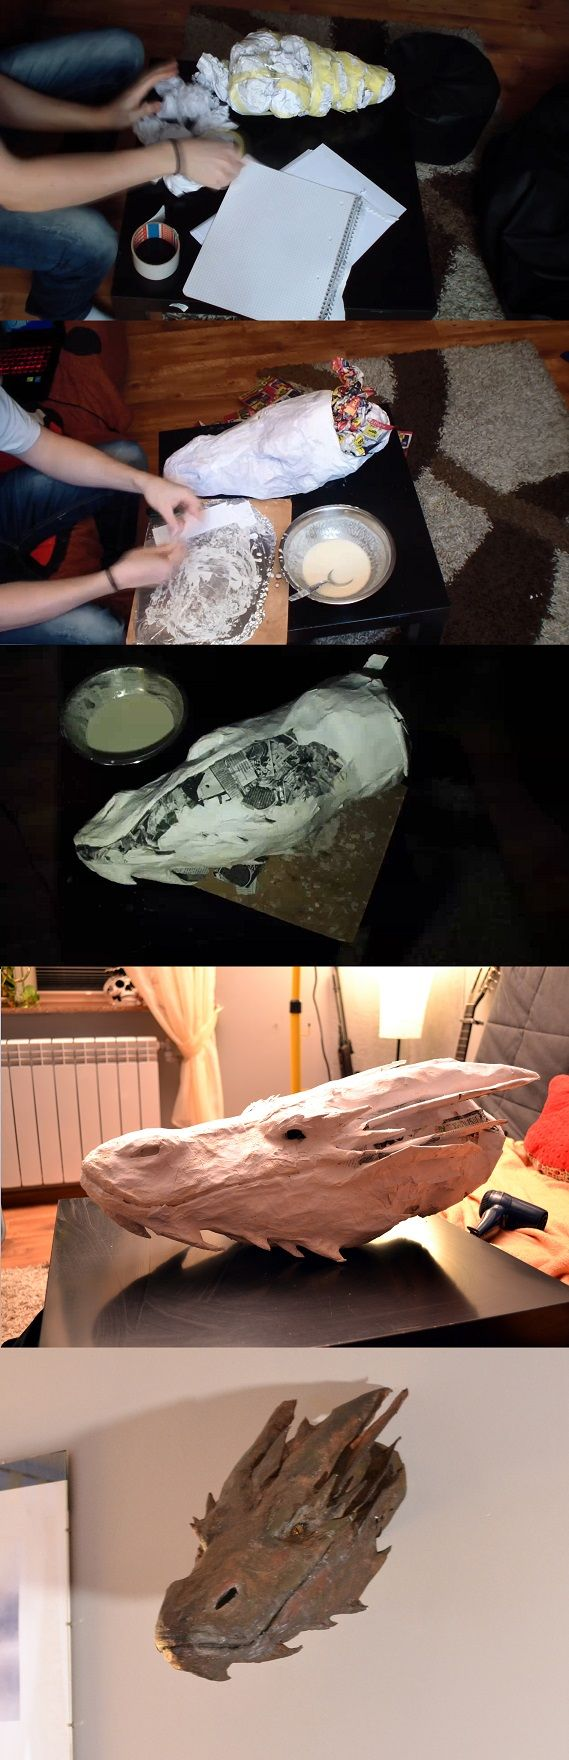 Paper mache Smaug head   https://www.youtube.com/watch?v=y586n2D-t8Y